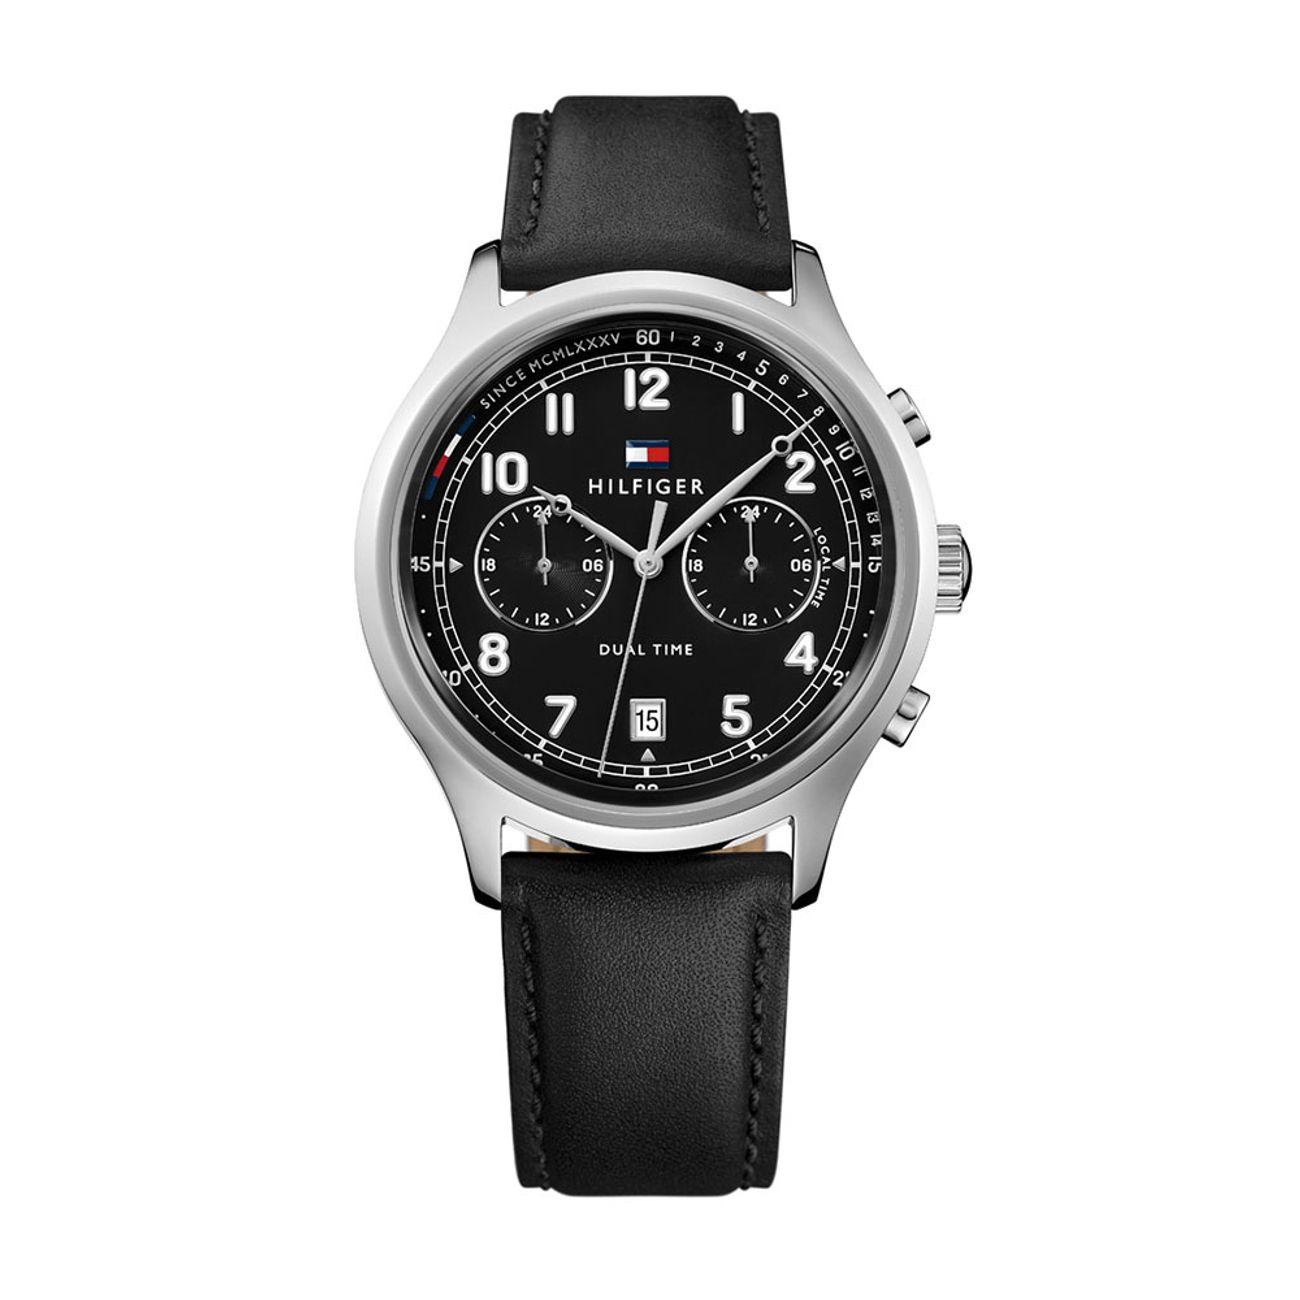 7e0642cc4dc8 Reloj Tommy Hilfiger 1791388 - Style Watch